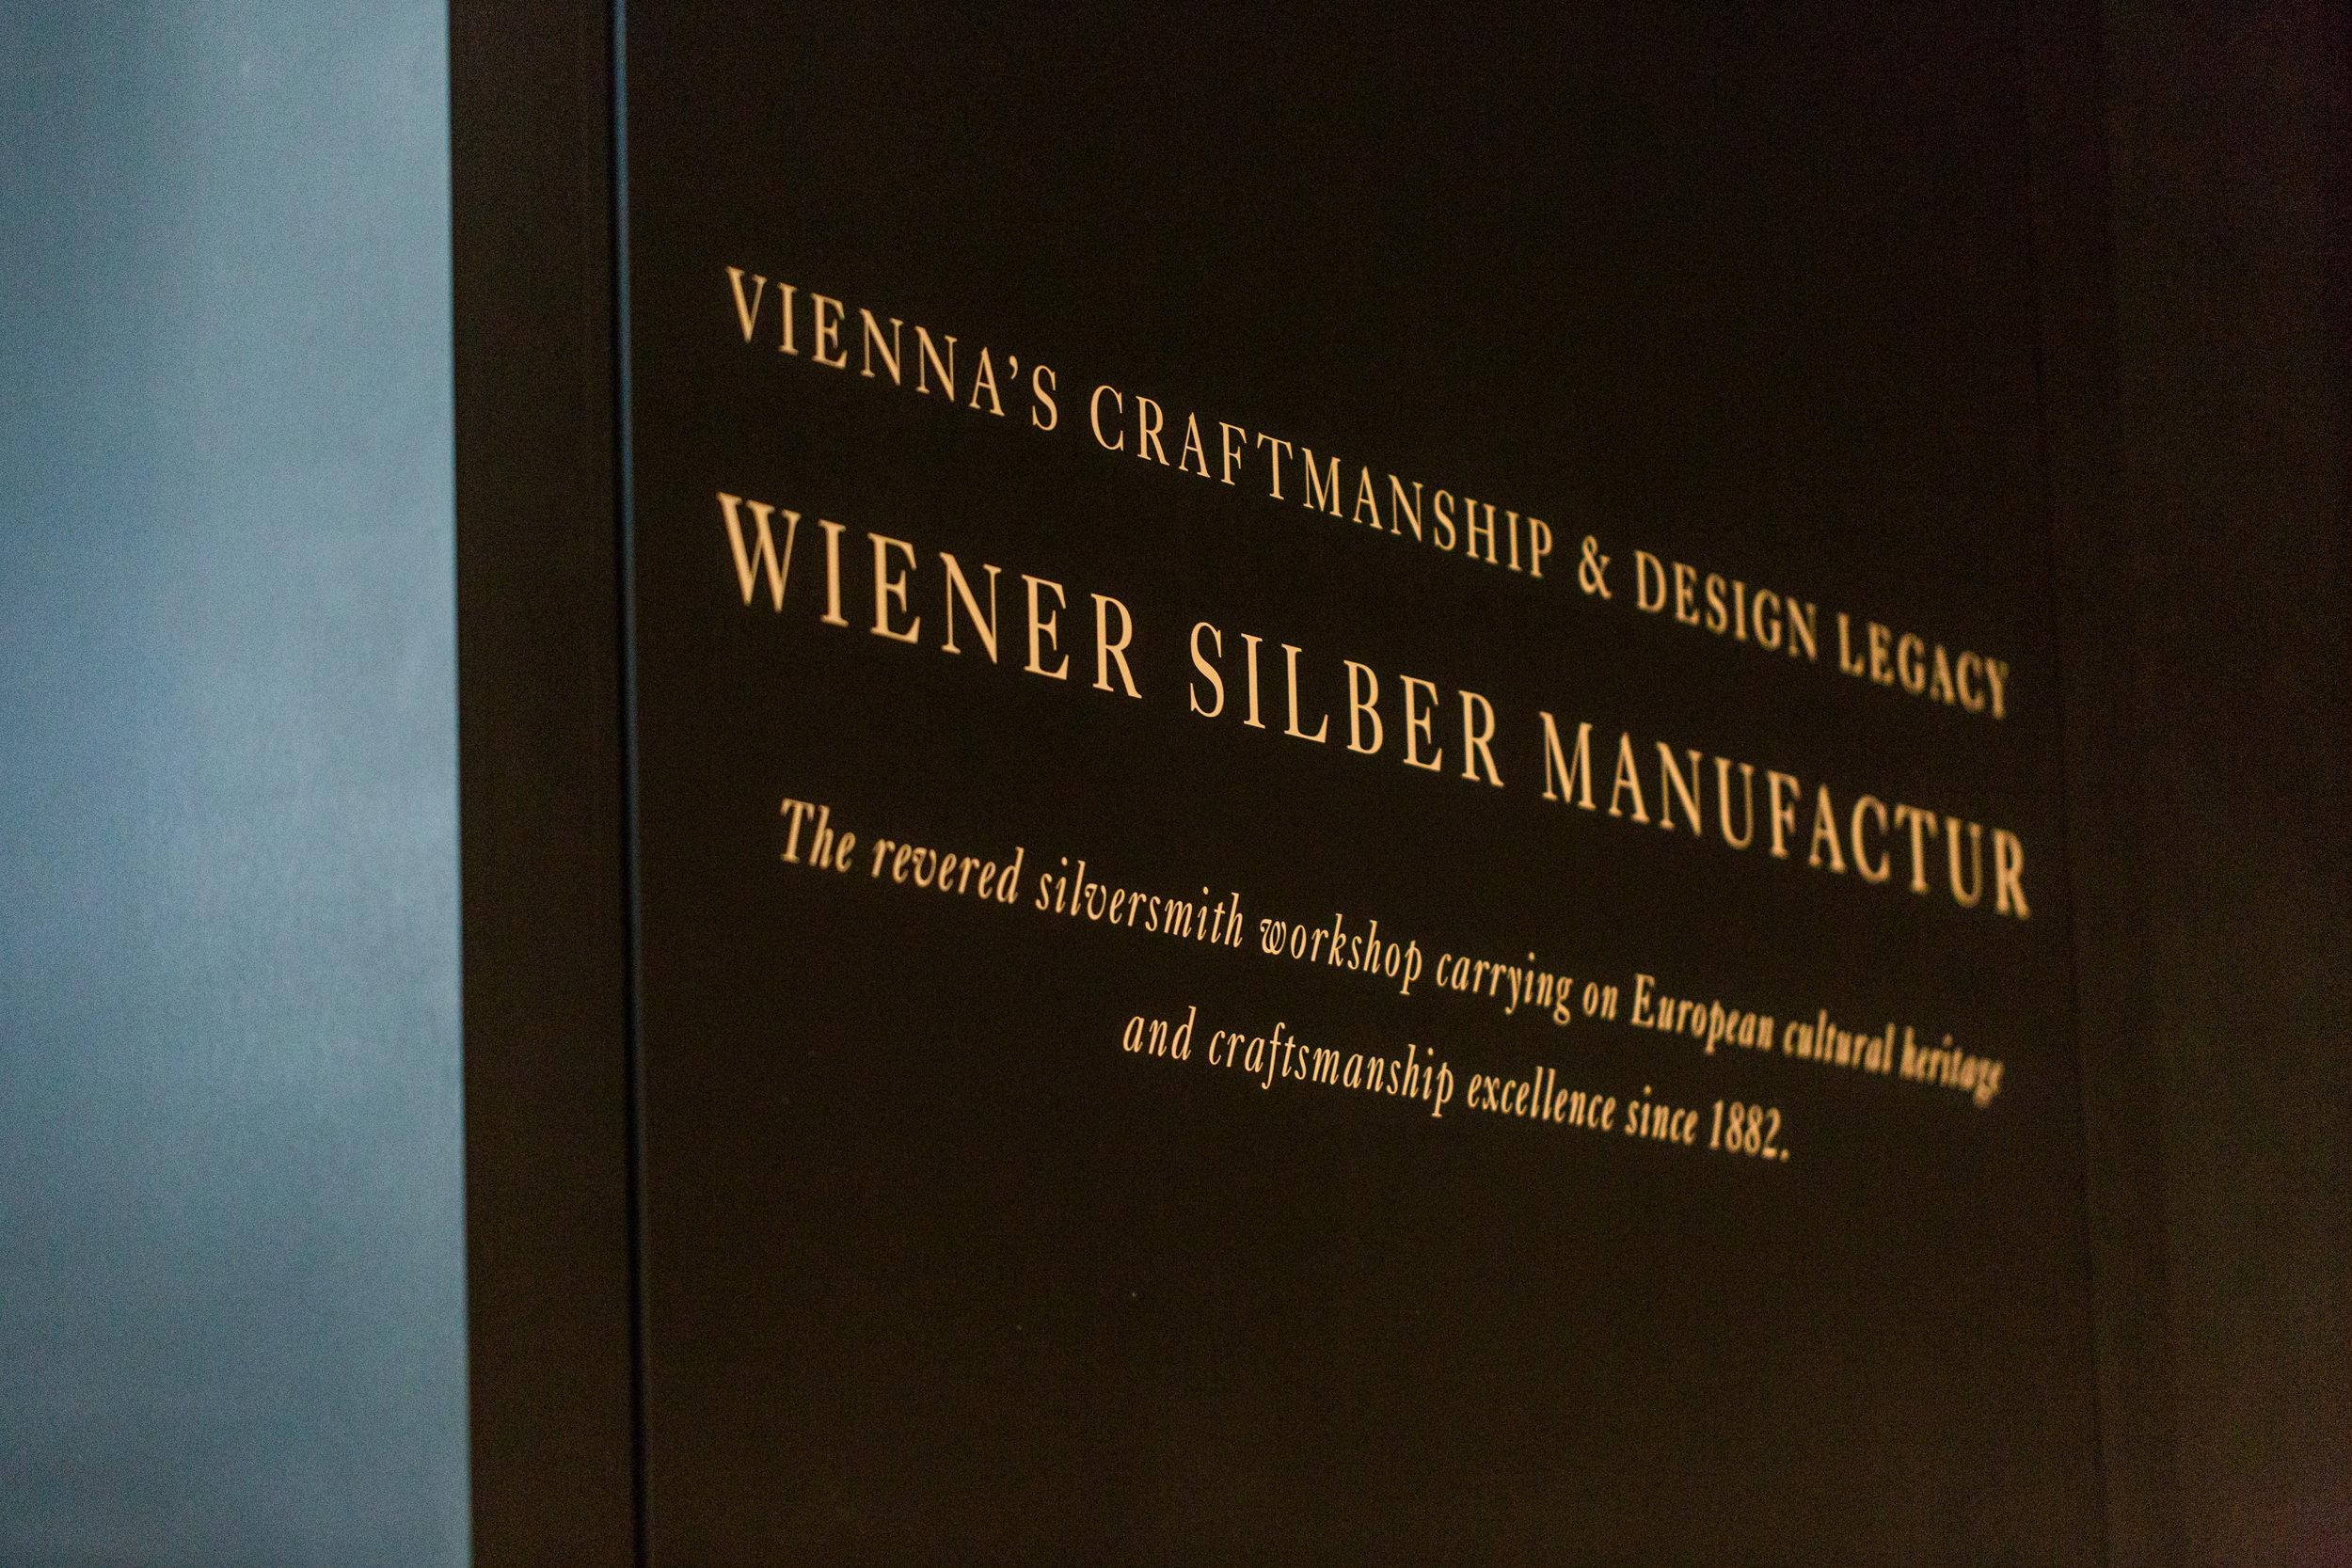 Vienna's Legacy I: Wiener Silber